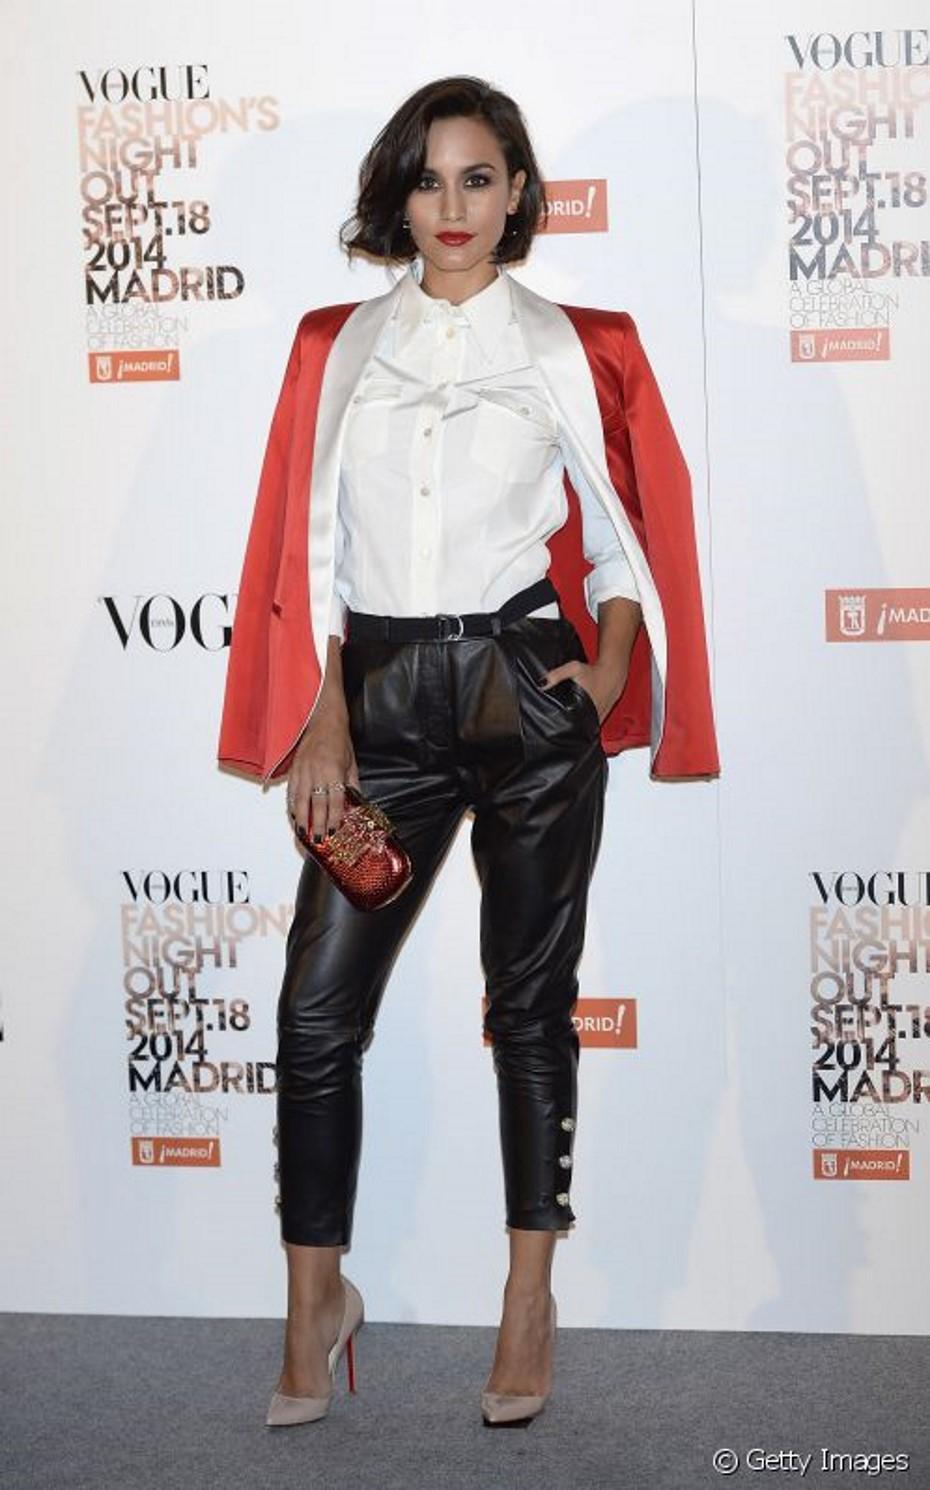 Megan Montaner ed il suo stile